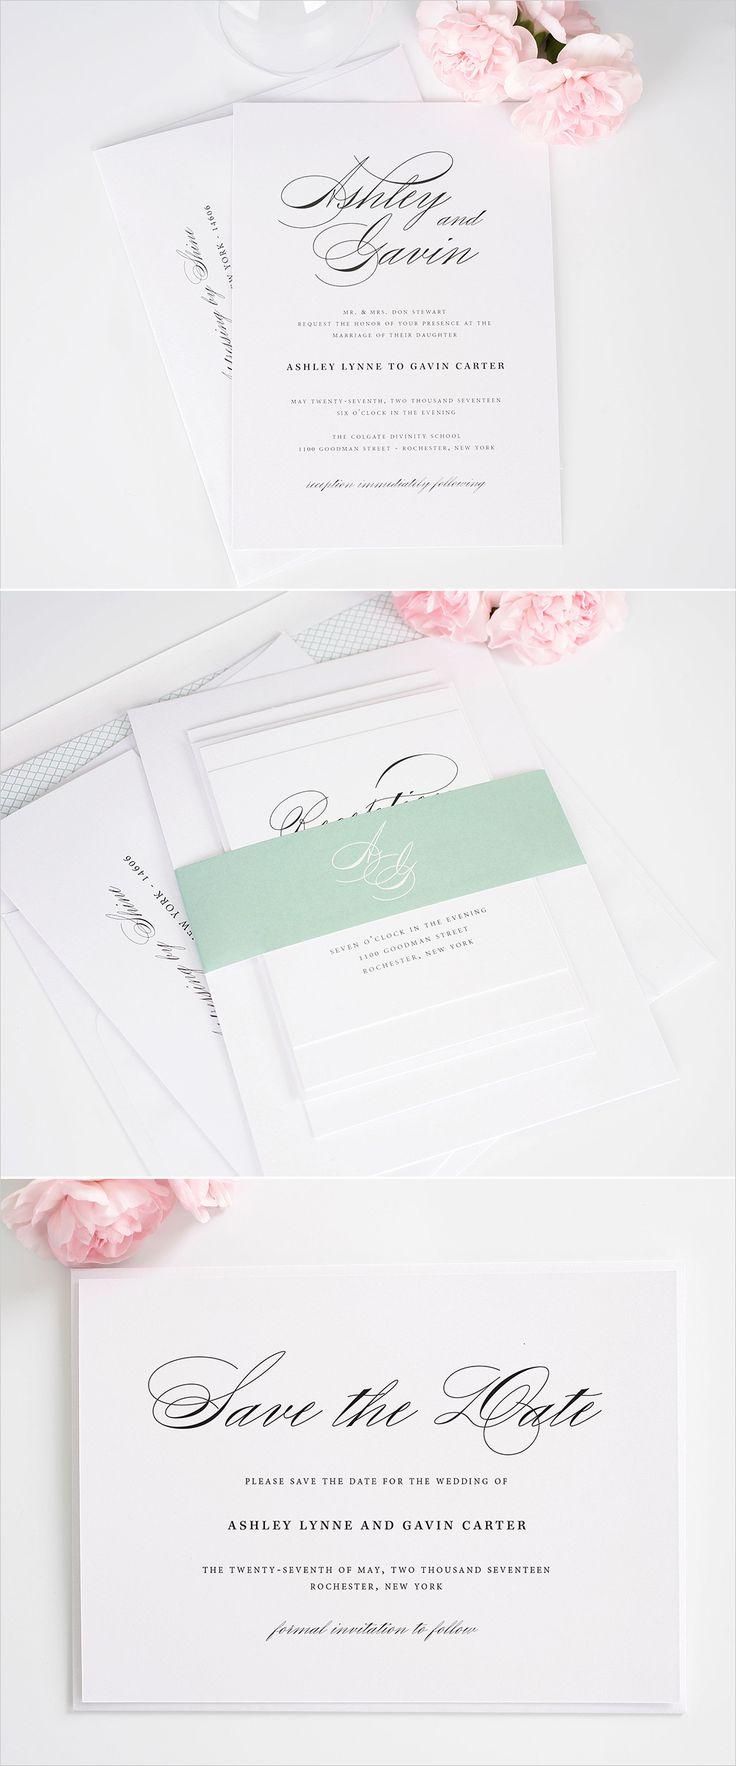 333 Best The Invitations Images On Pinterest Bridal Invitations